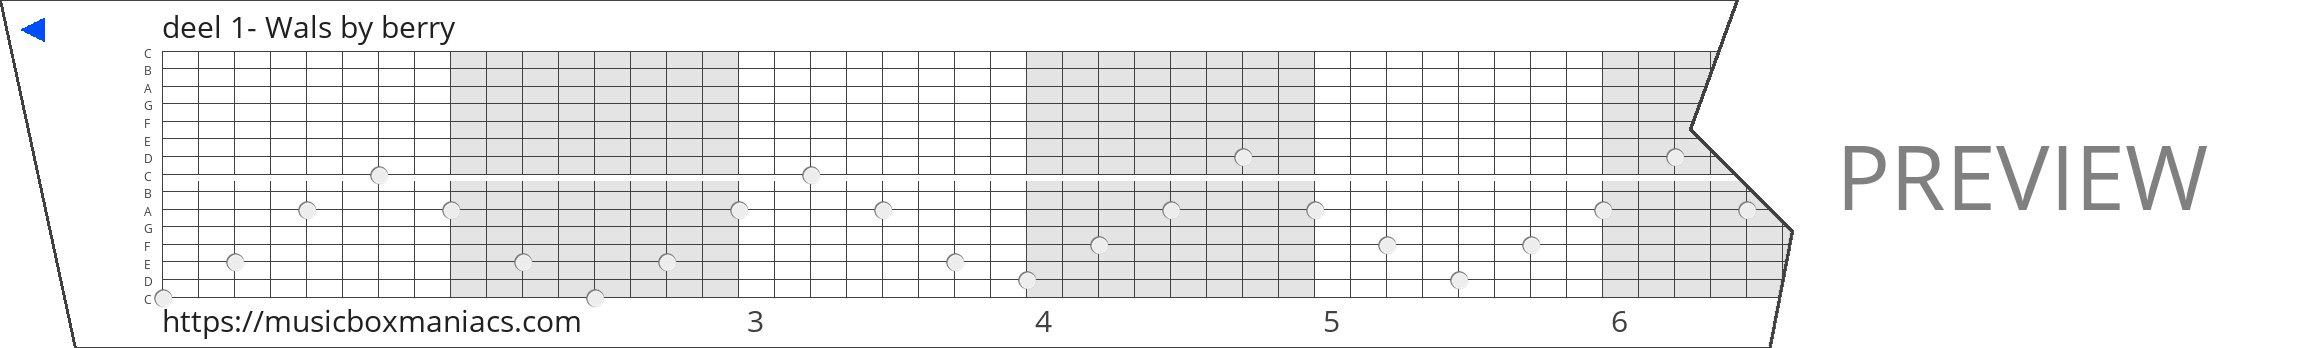 deel 1- Wals 15 note music box paper strip